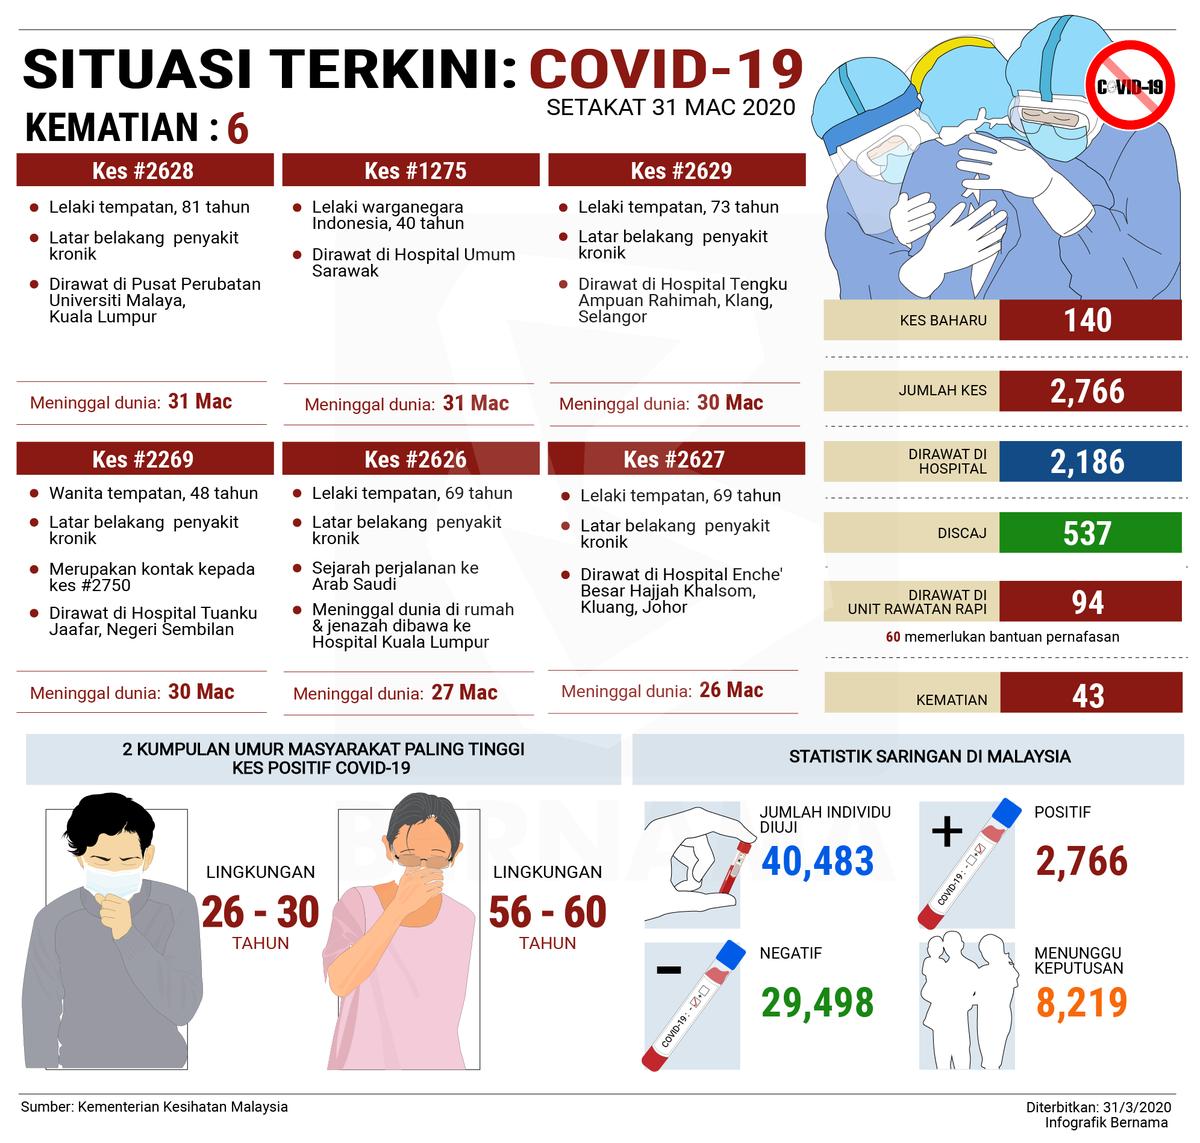 [Infografik] Situasi terkini #COVIDー19 (31 Mac)  [Infographics] #COVIDー19 situation update (March 31)  #COVID19Malaysia  #PerintahKawalanPergerakan #DudukRumah  #StayHomeStaySafe